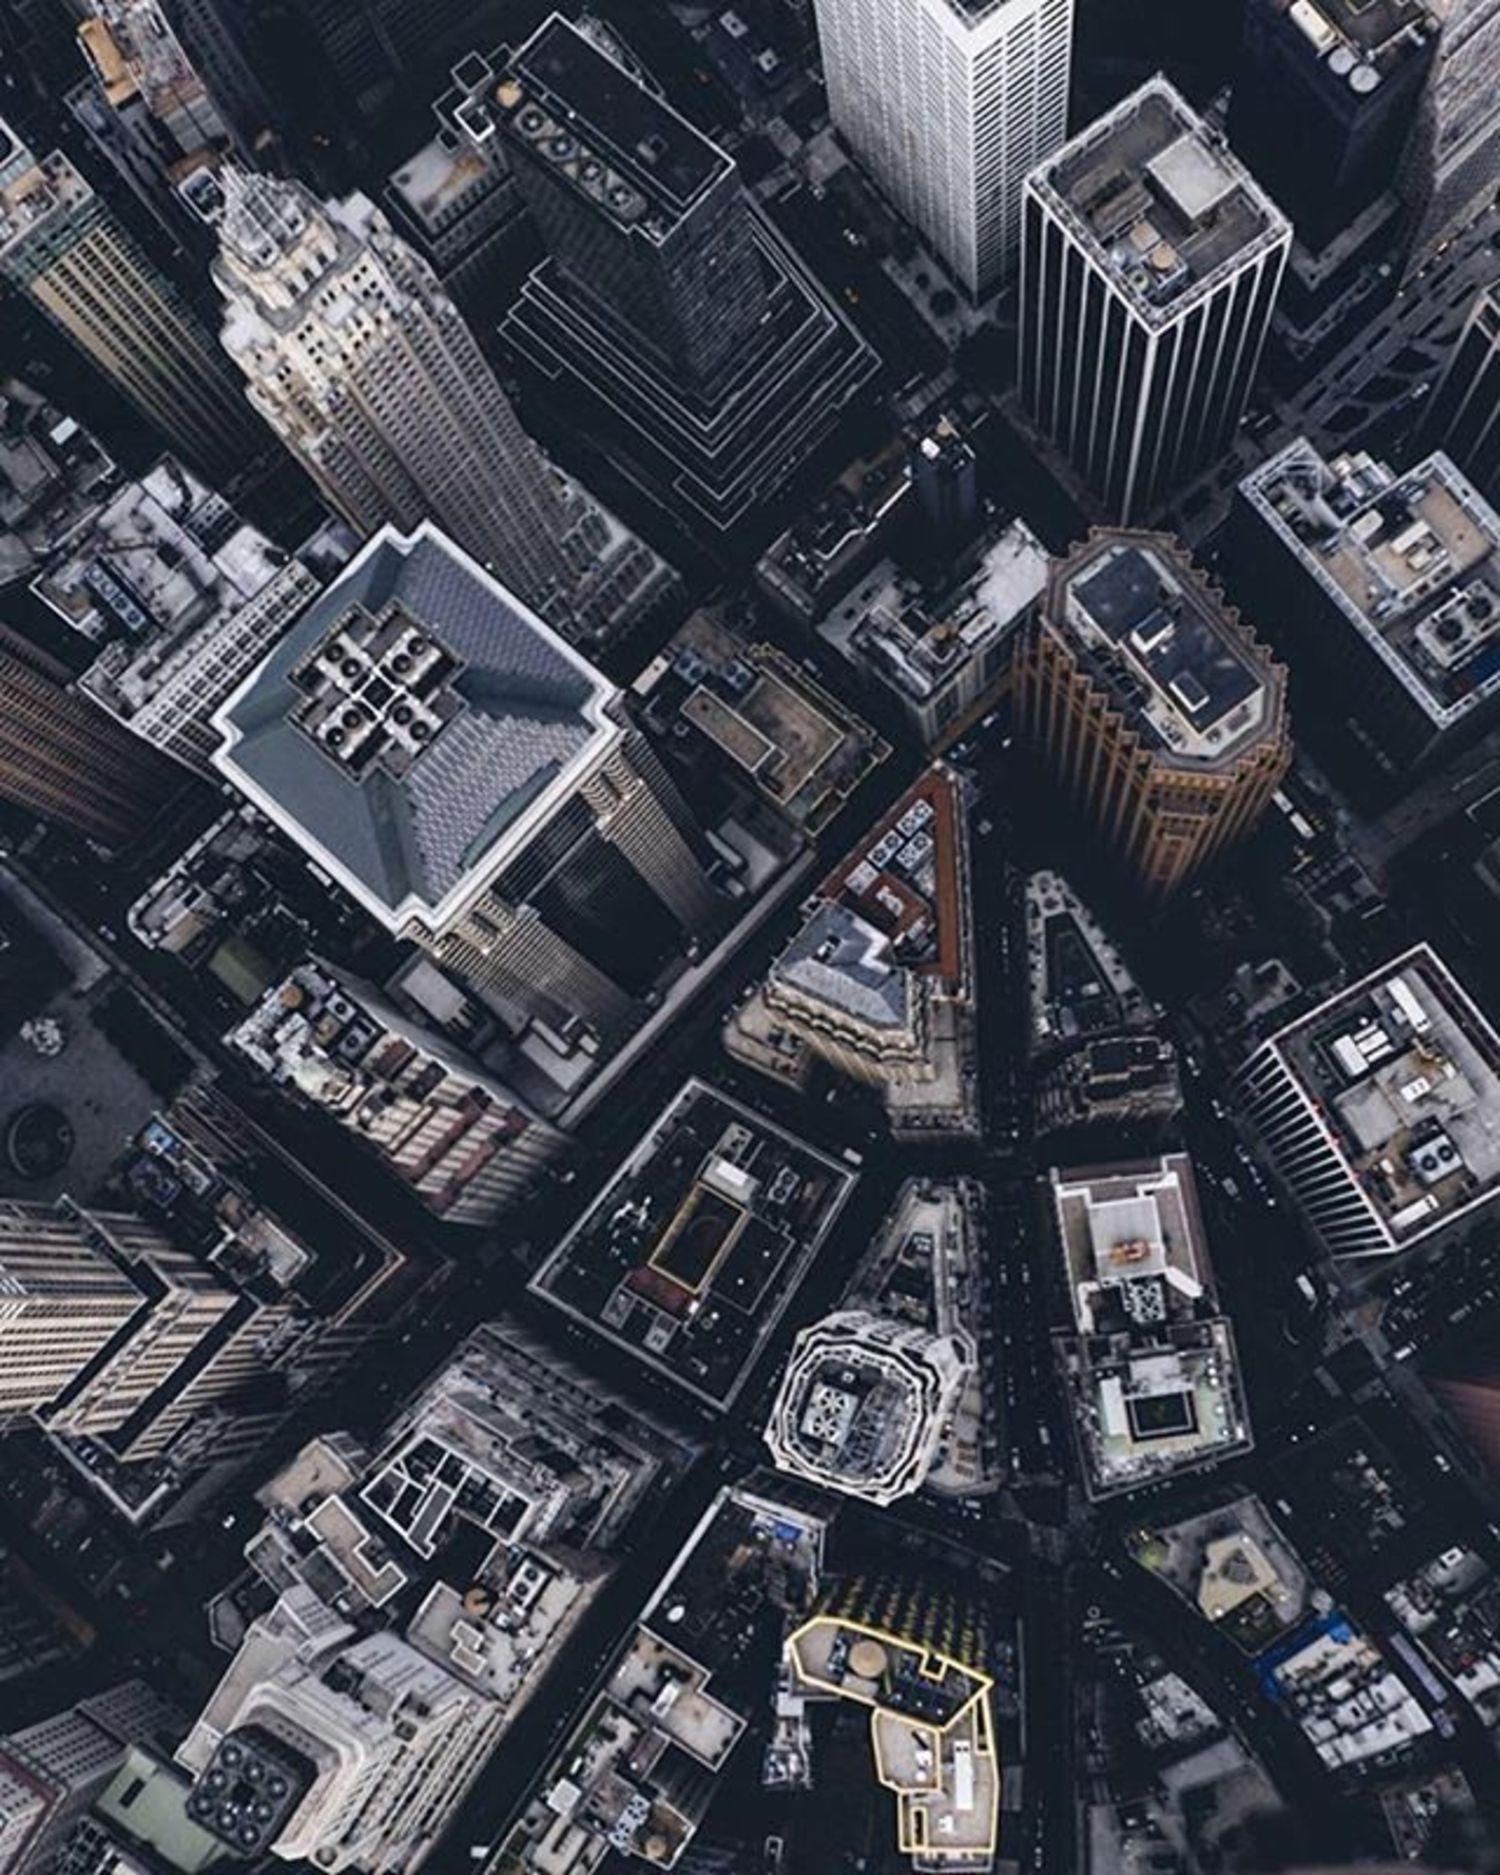 New York, New York. Photo via @xtramoney #viewingnyc